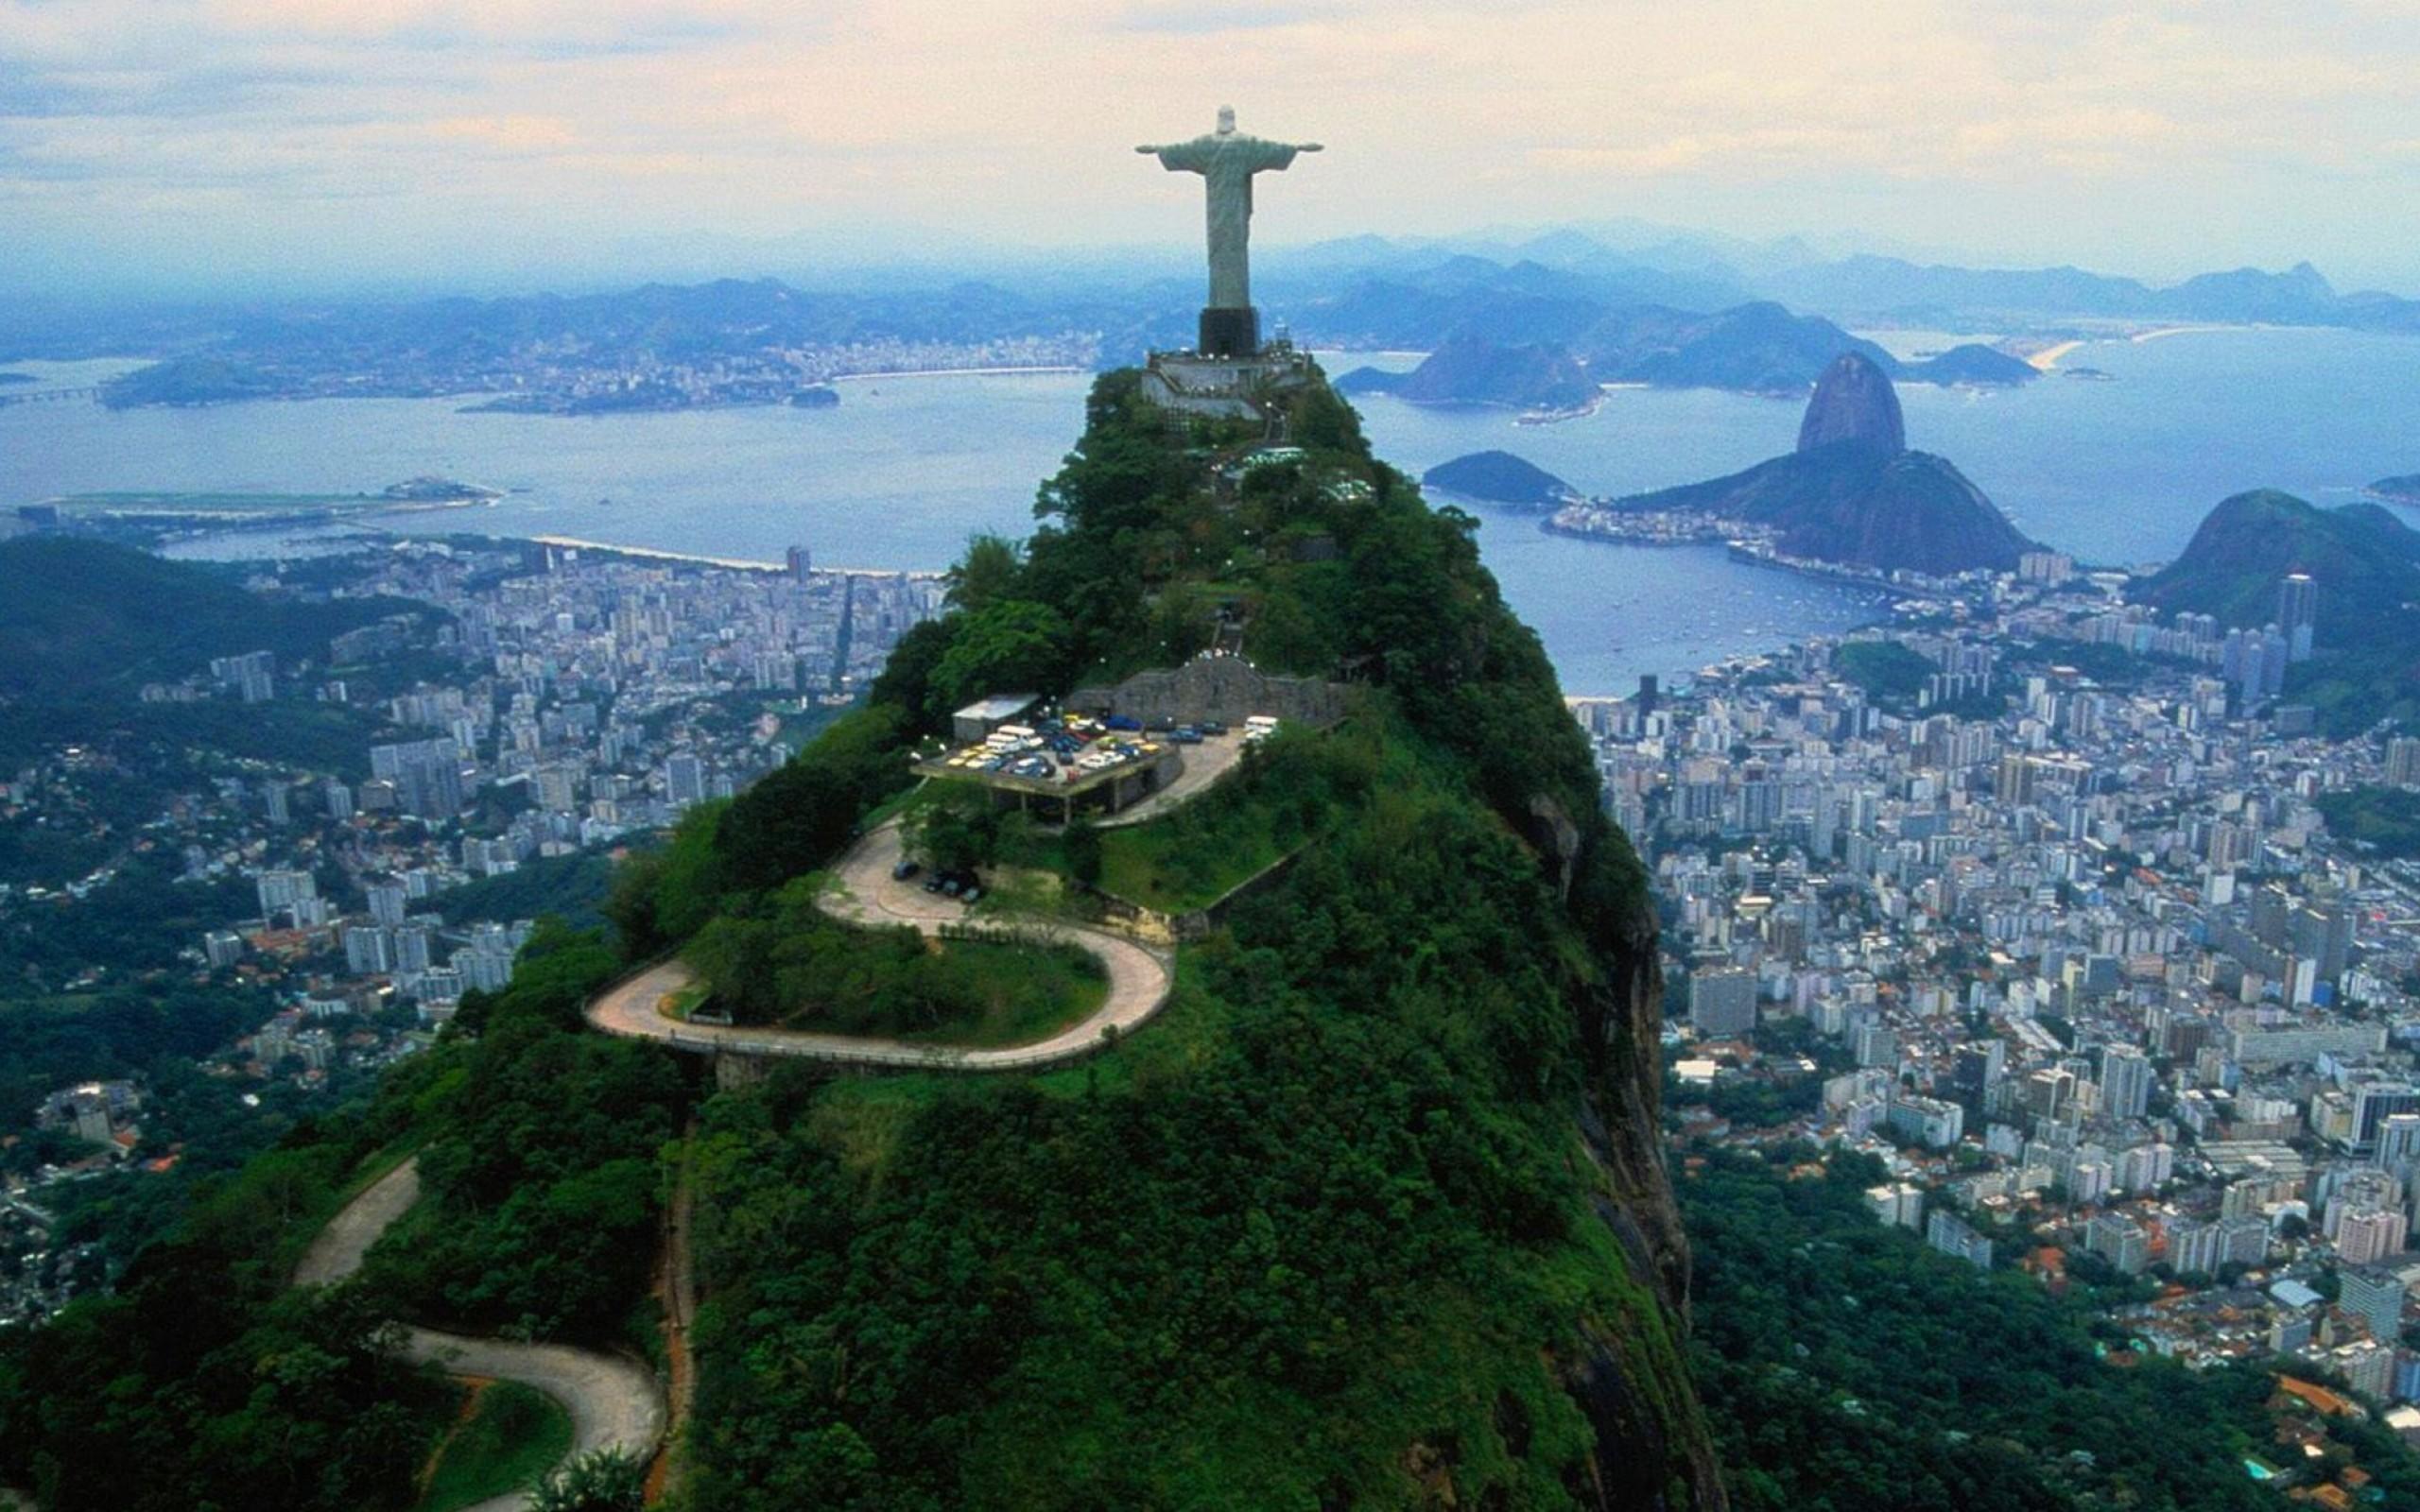 Statue-of-Jesus-Rio-de-Janeiro-Brazil-HD